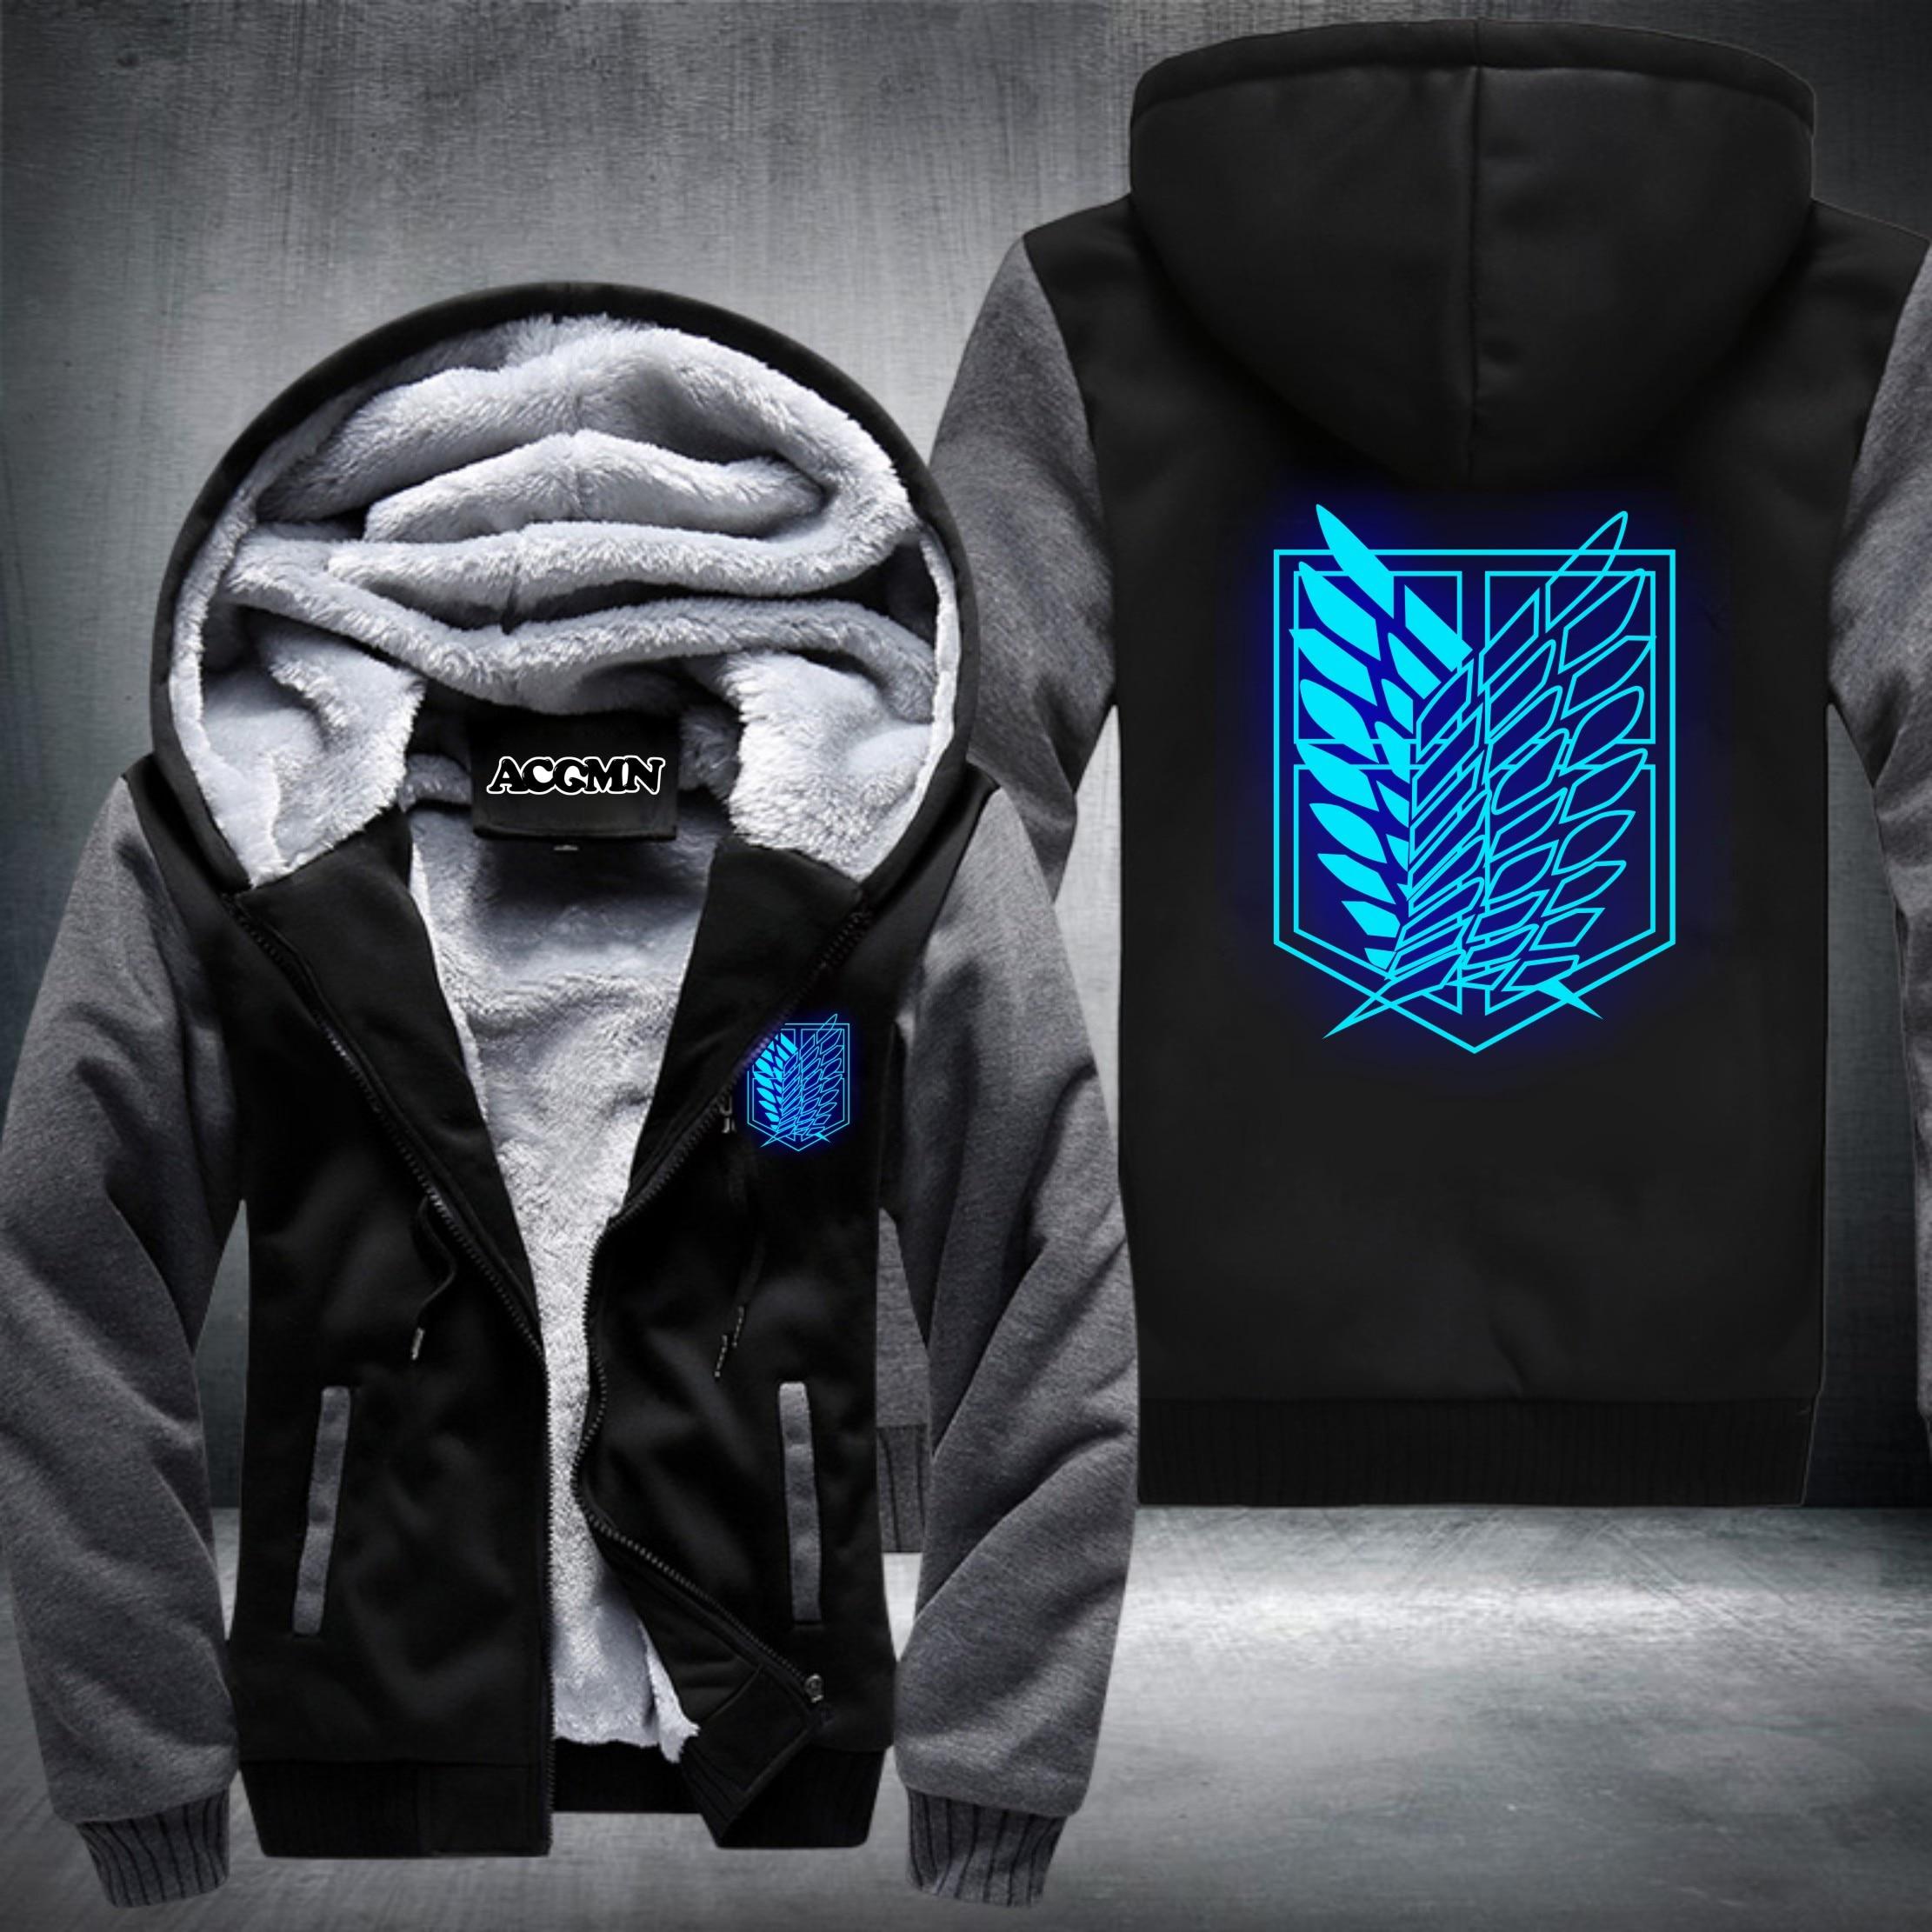 New Shingeki No Kyojin Attack on Titan Aren Thicken jacket hoodies coat extra cotton Black BLUE GREY RED USA Size